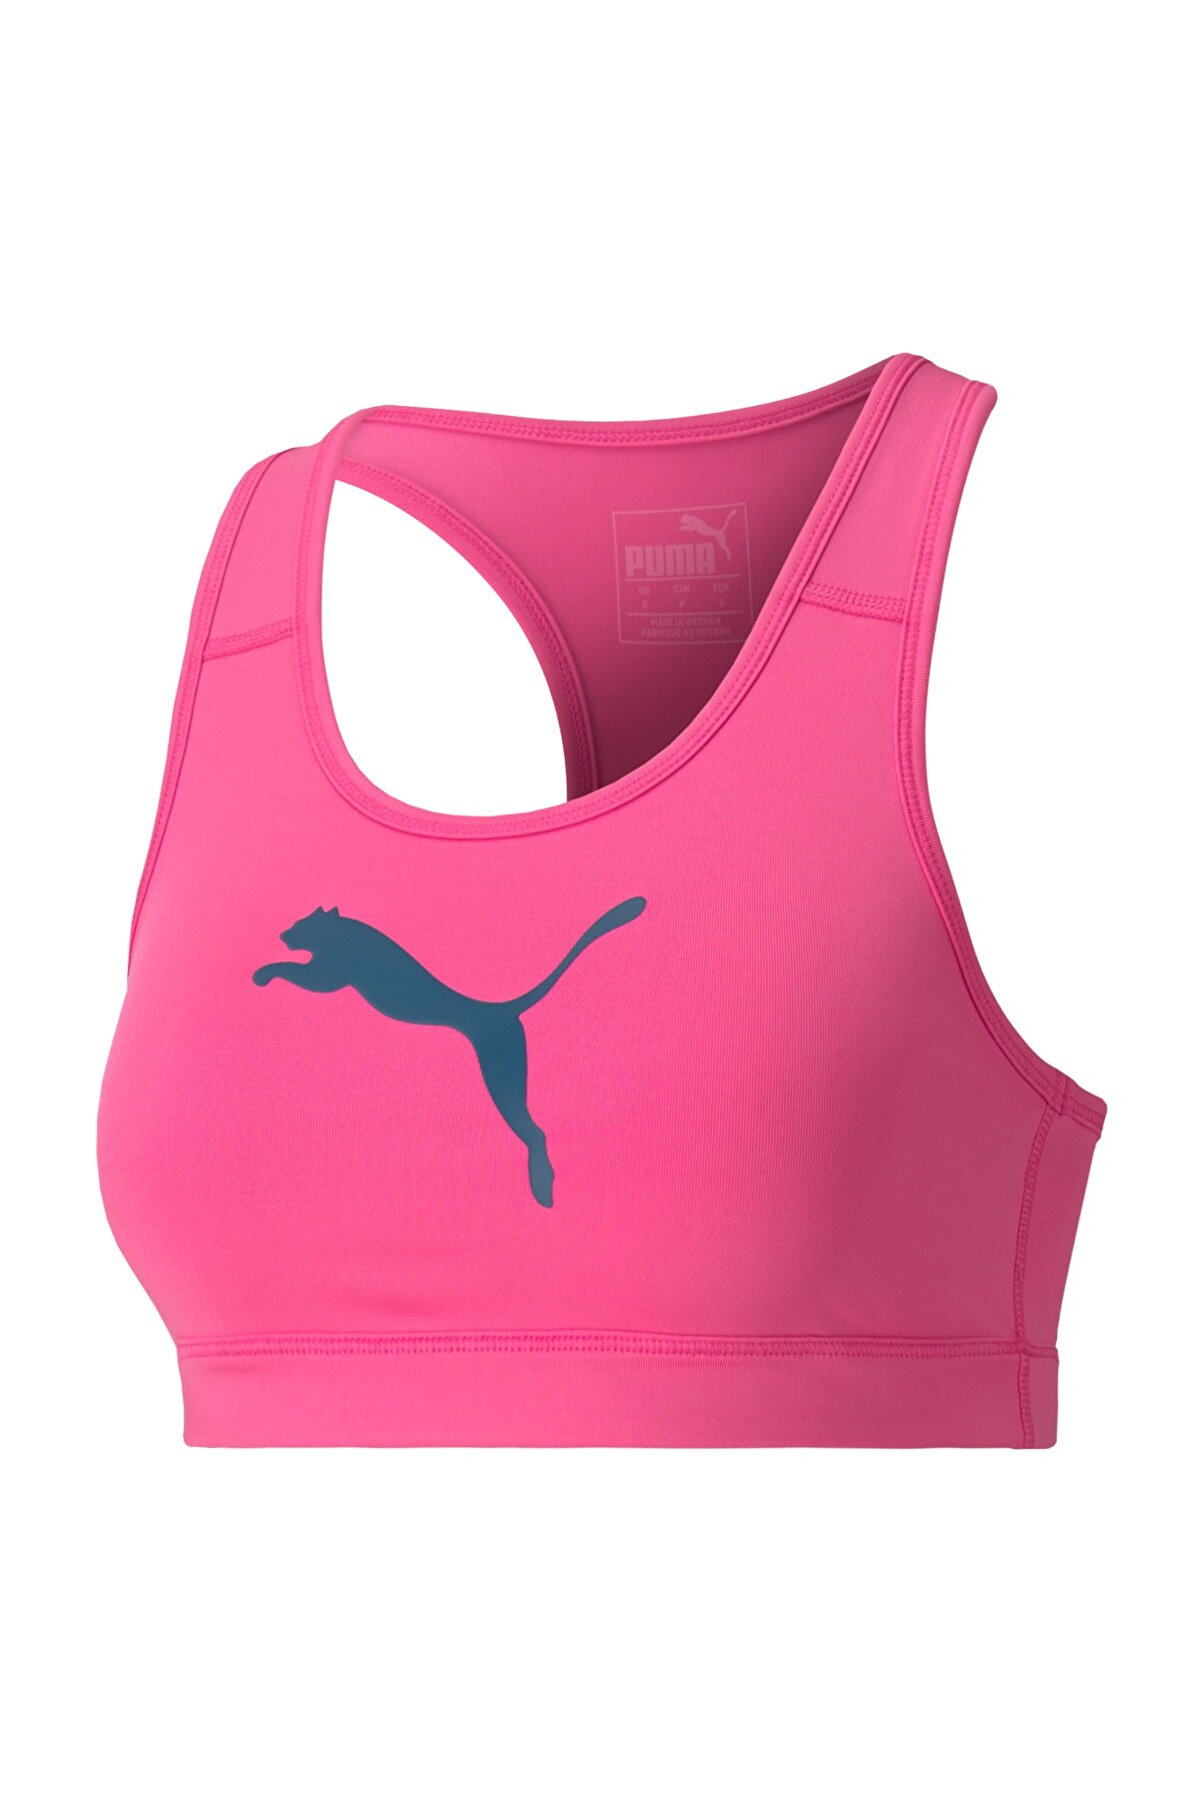 Puma Kadın Spor Sütyeni - 4Keeps - 51915821